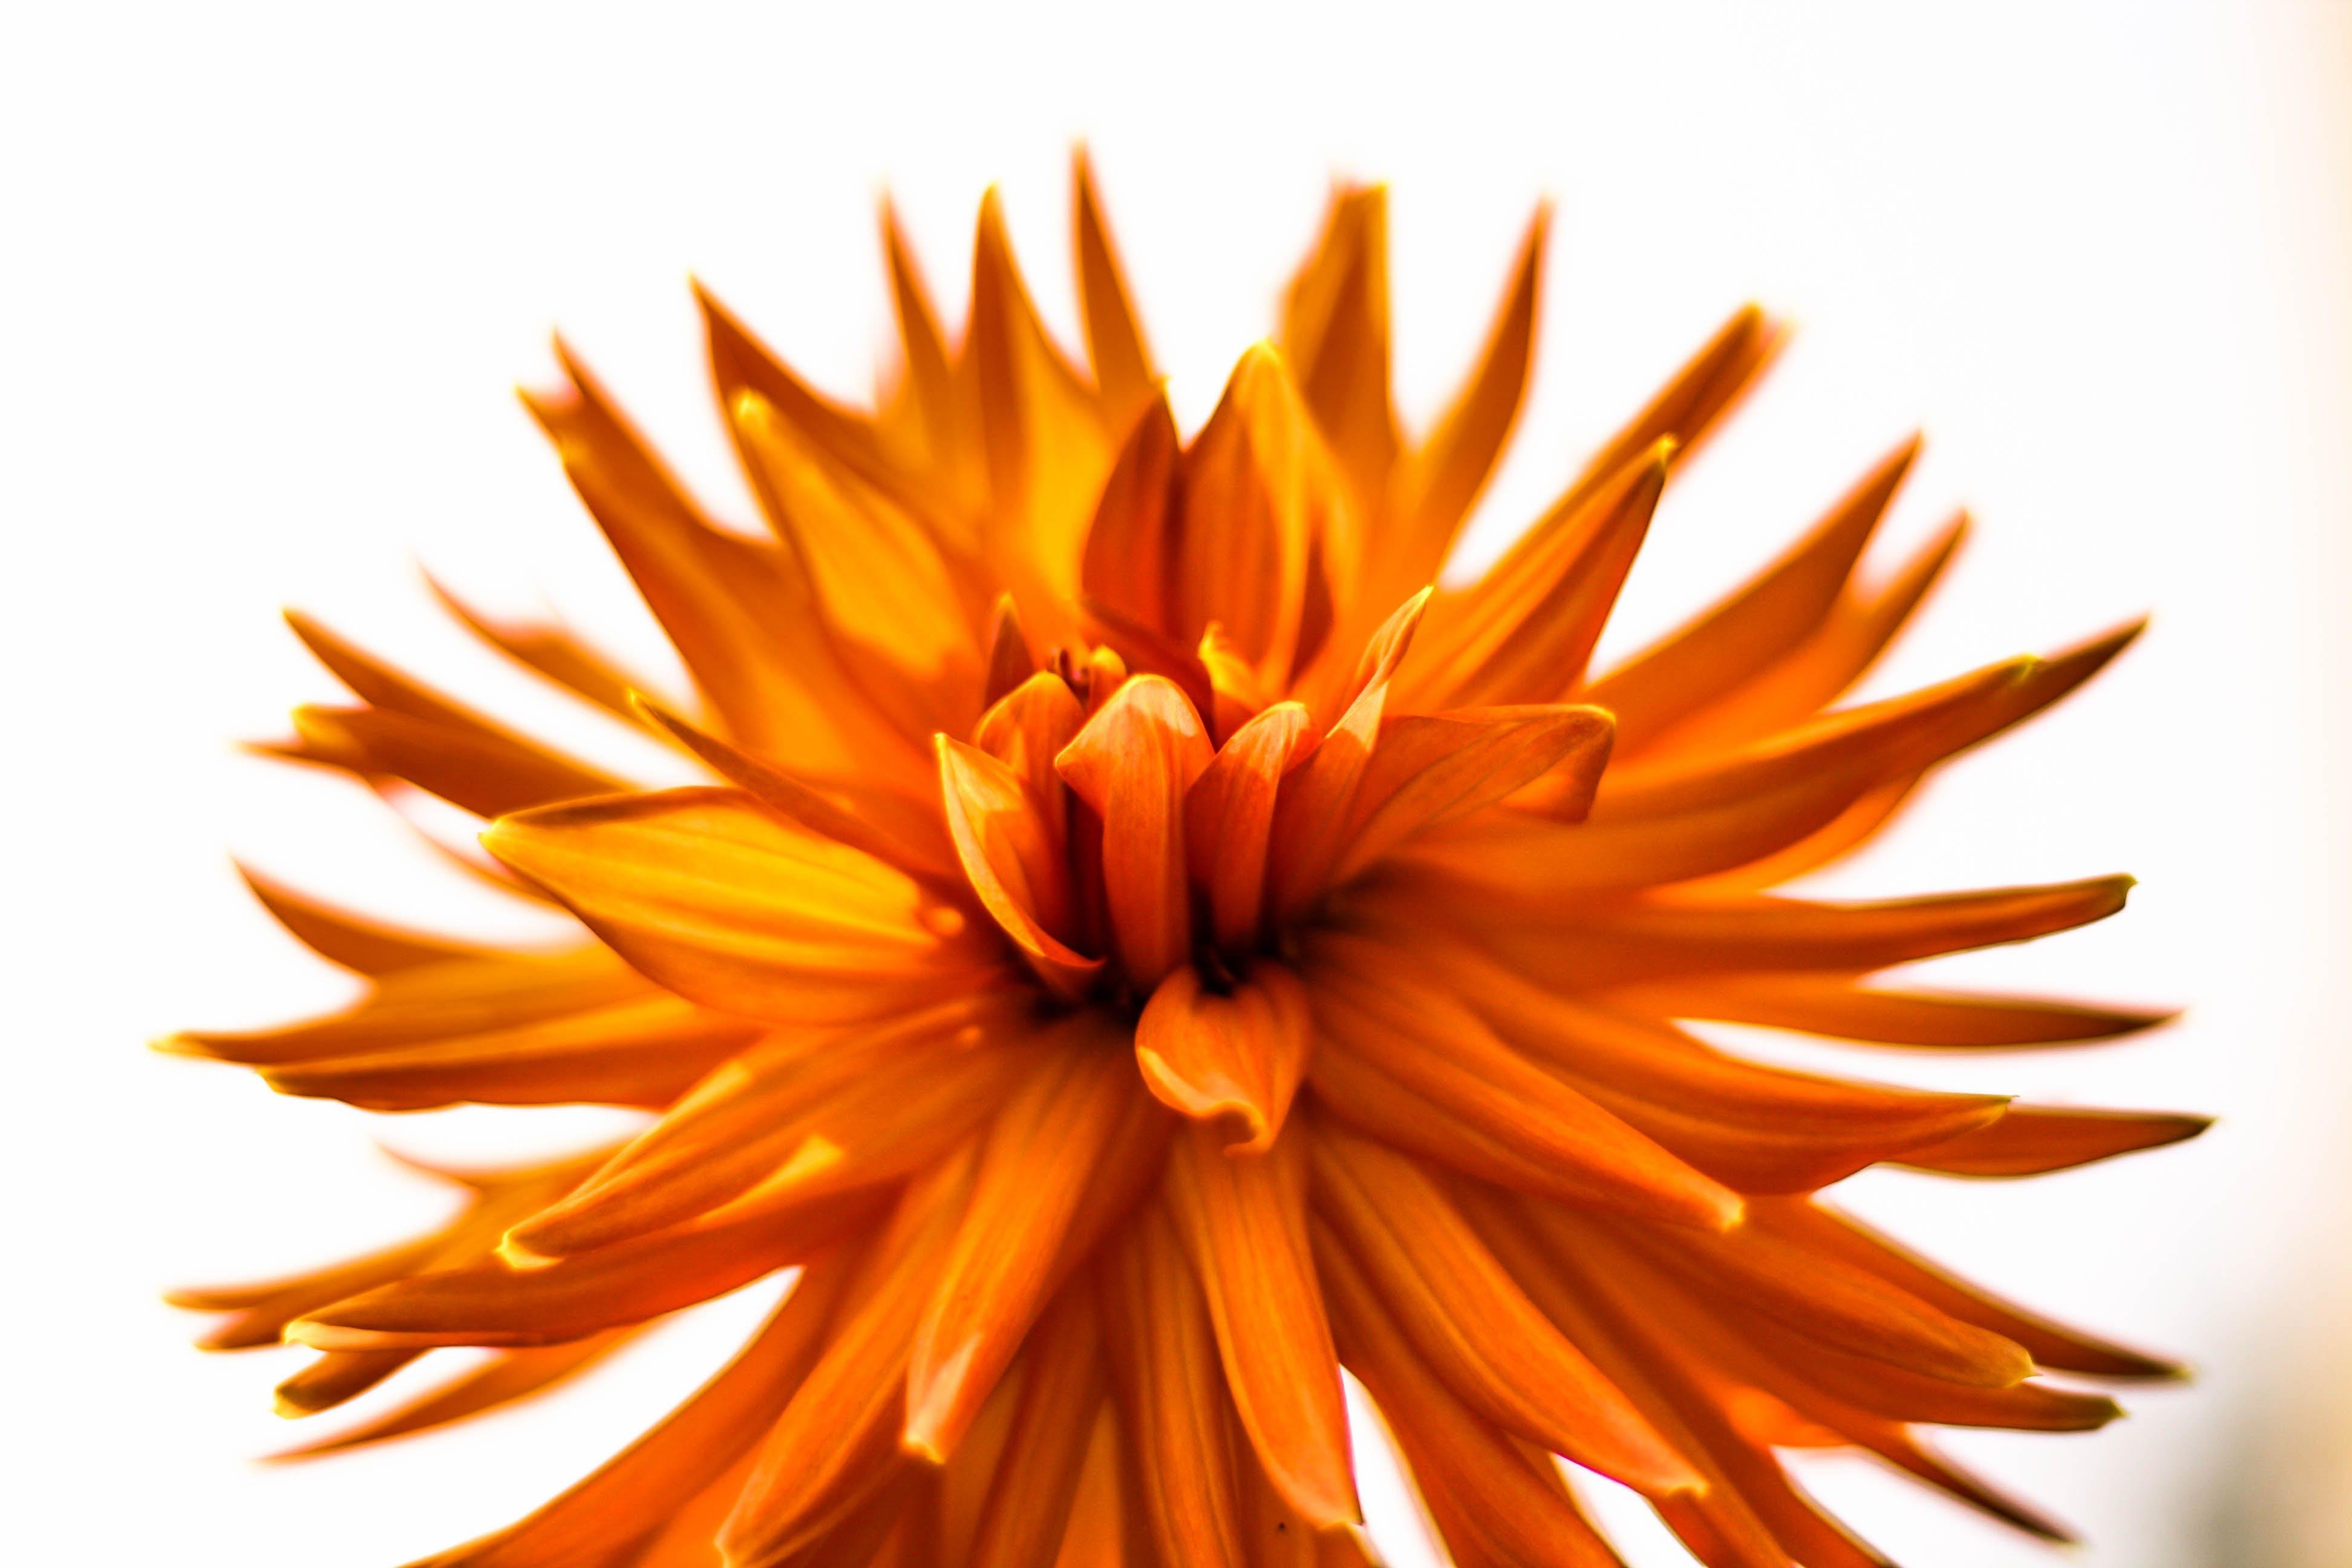 Closeup Photography of Orange Petaled Flowers